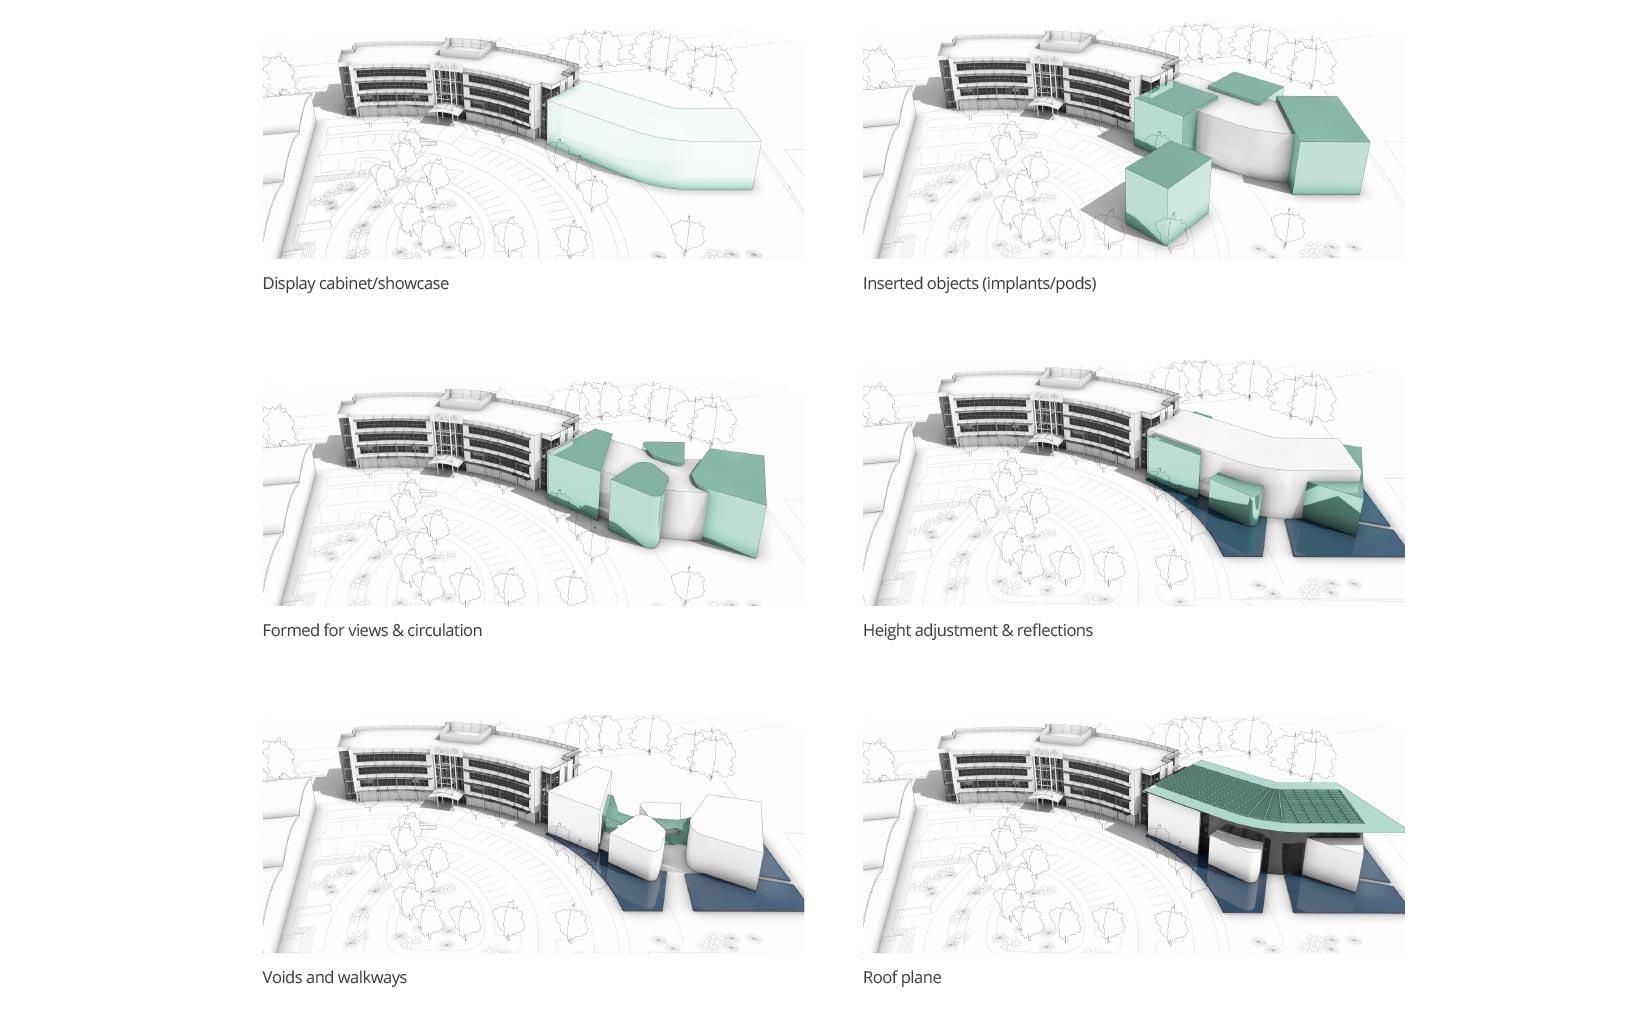 B. Braun Innovation, Communication & Education Centre, Sheffield, Concept Diagram